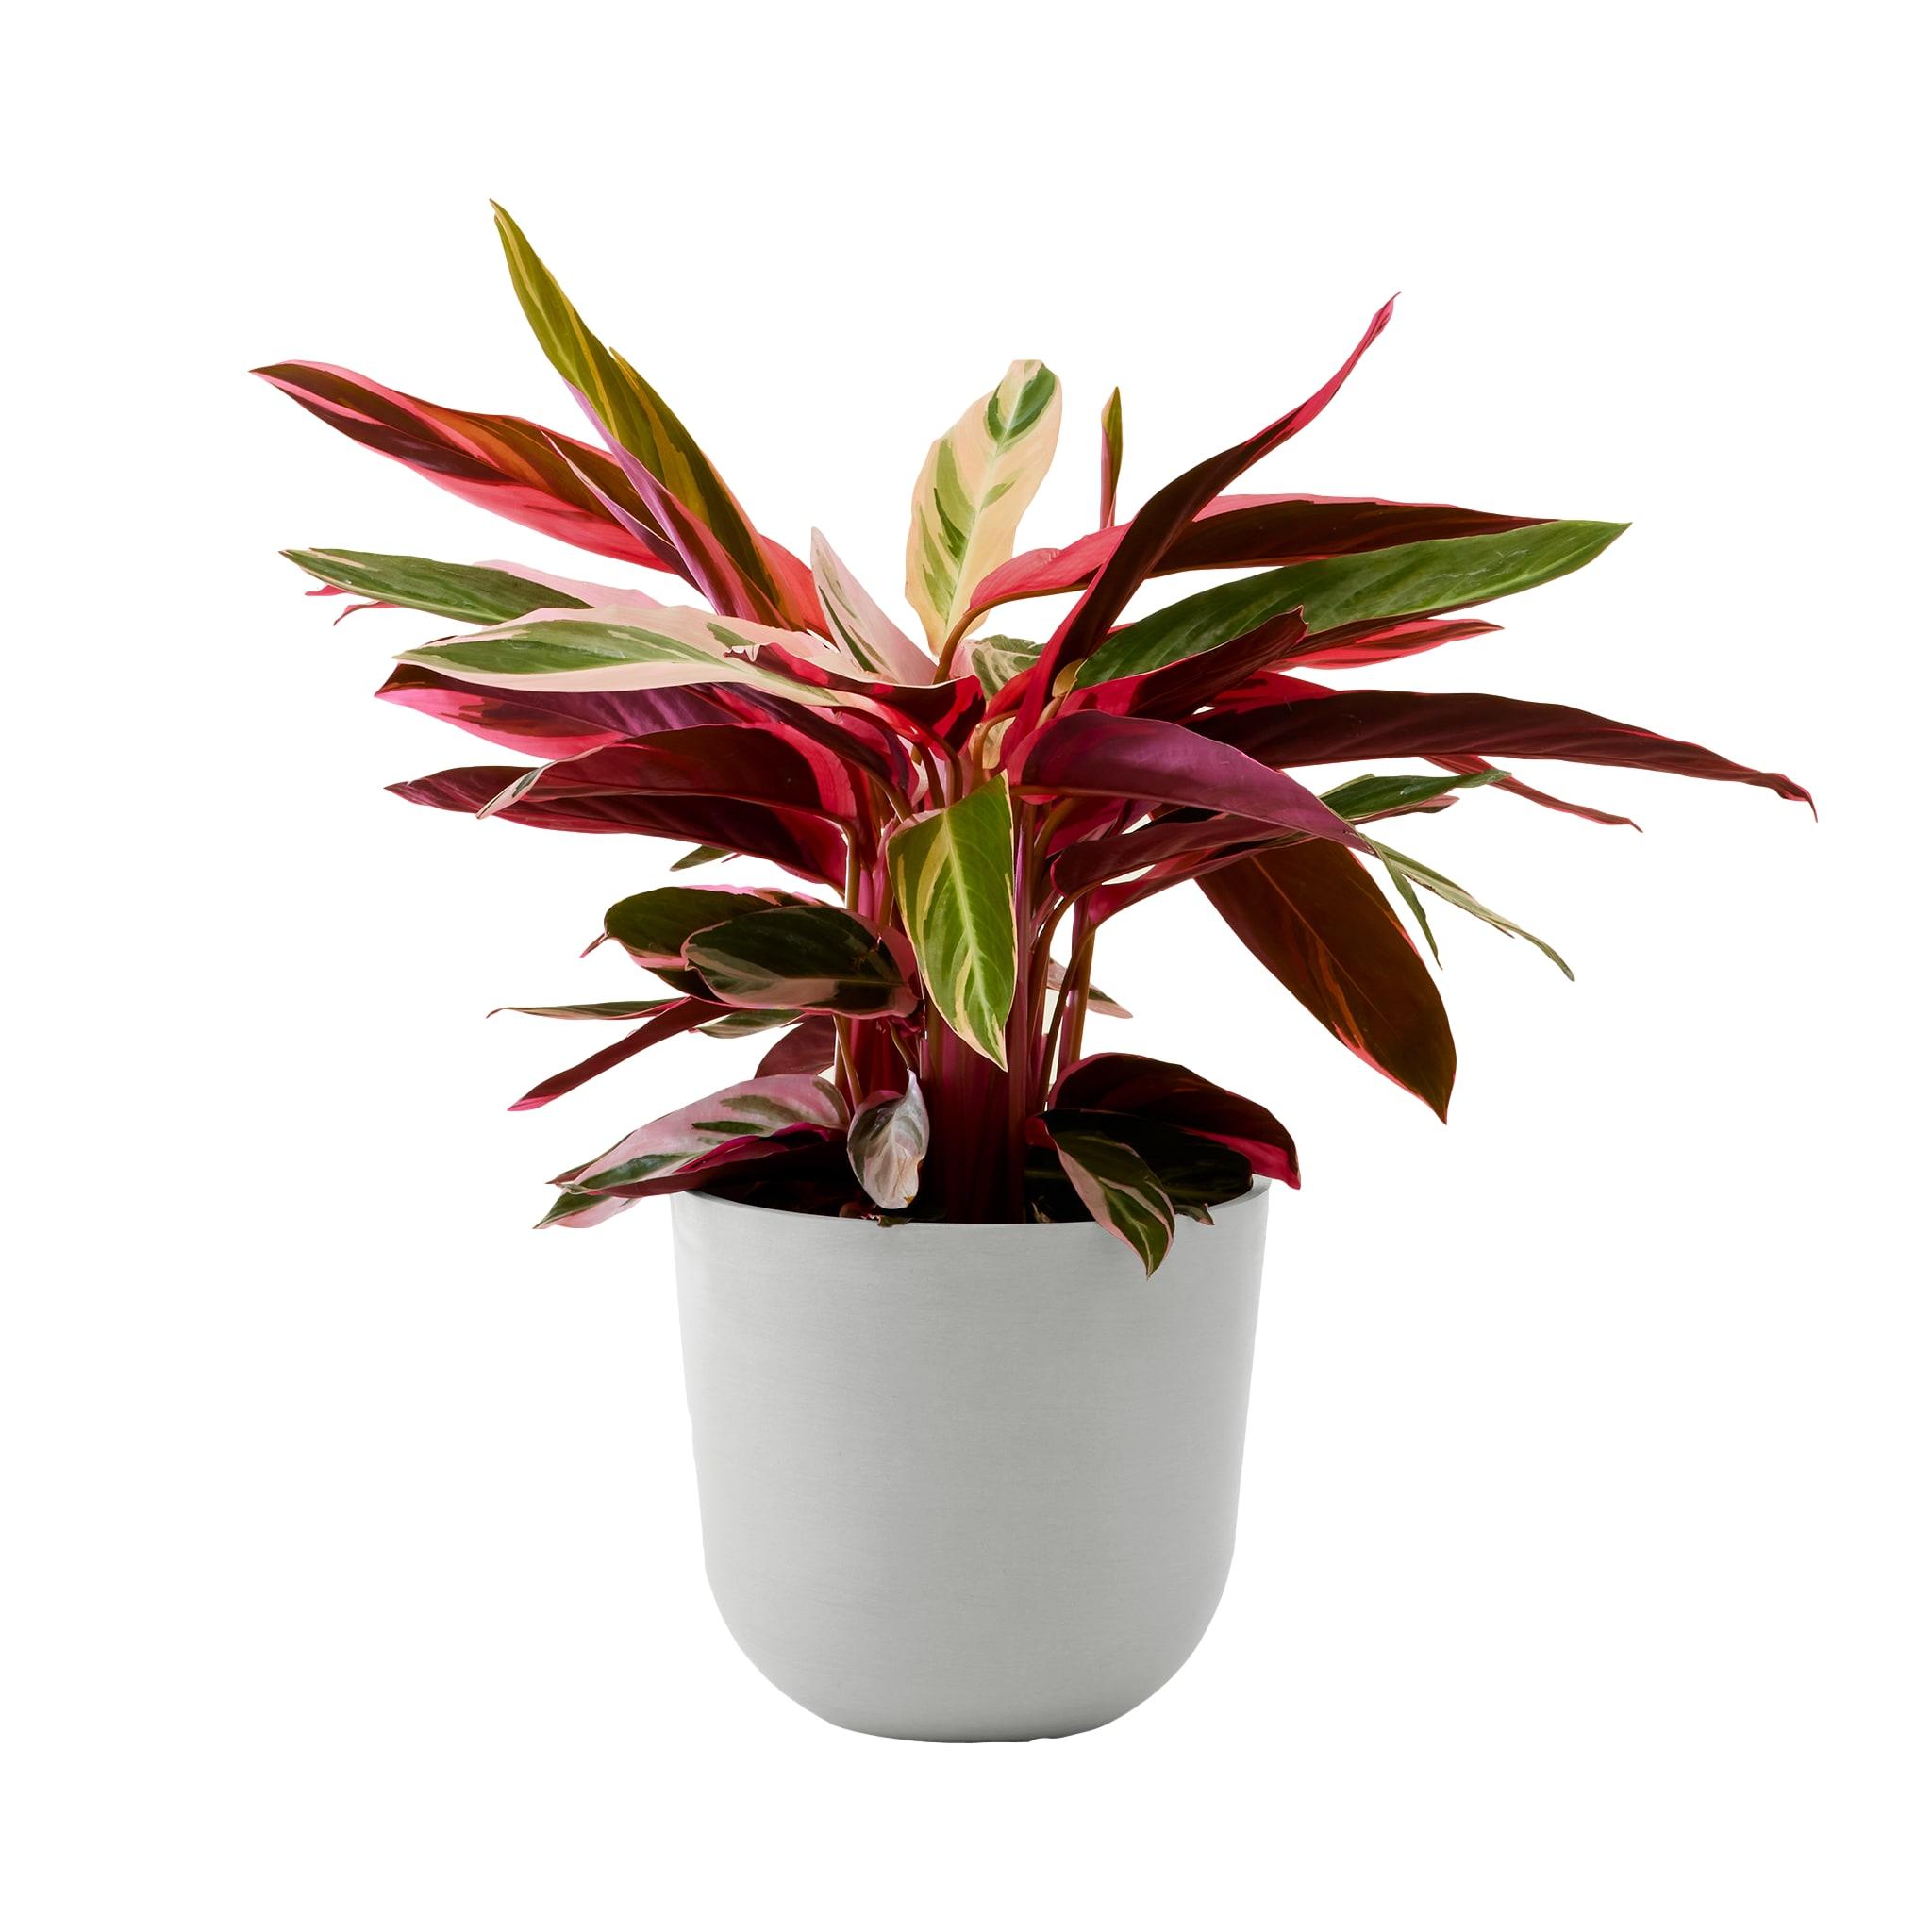 Plante - Calathea triostar 85 cm en pot blanc gris